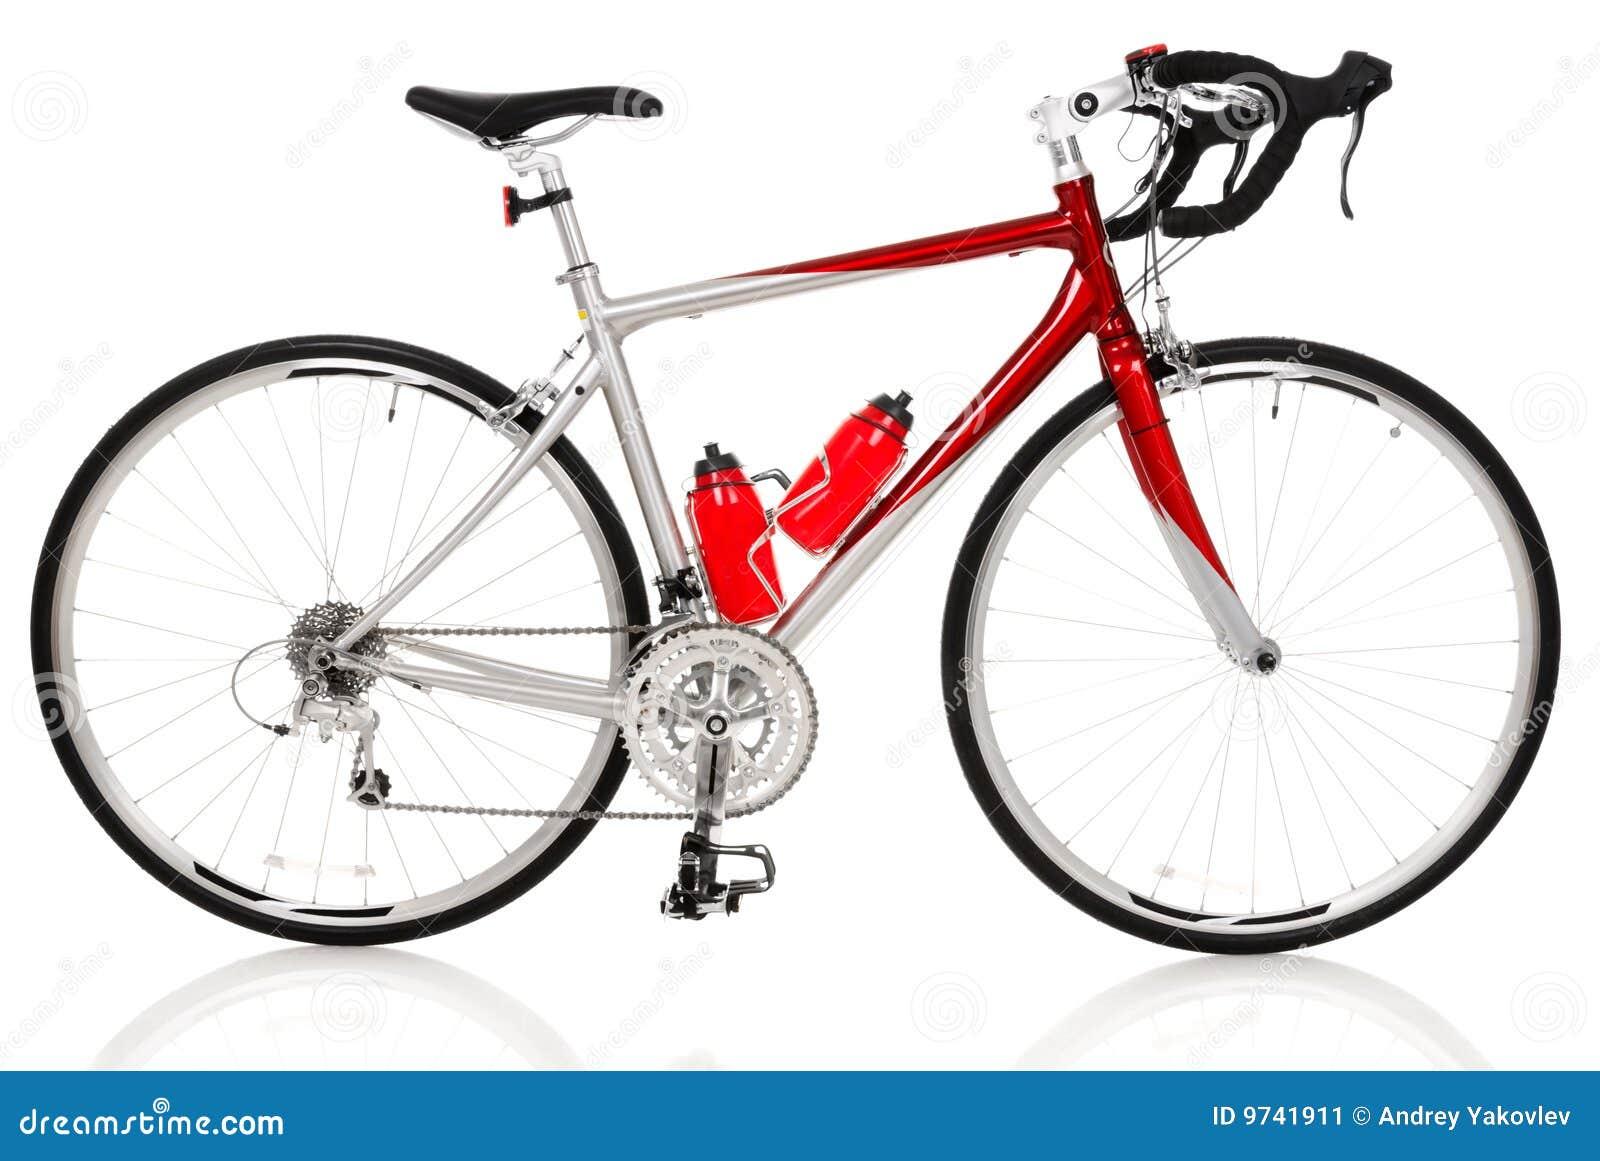 Cykelraceväg